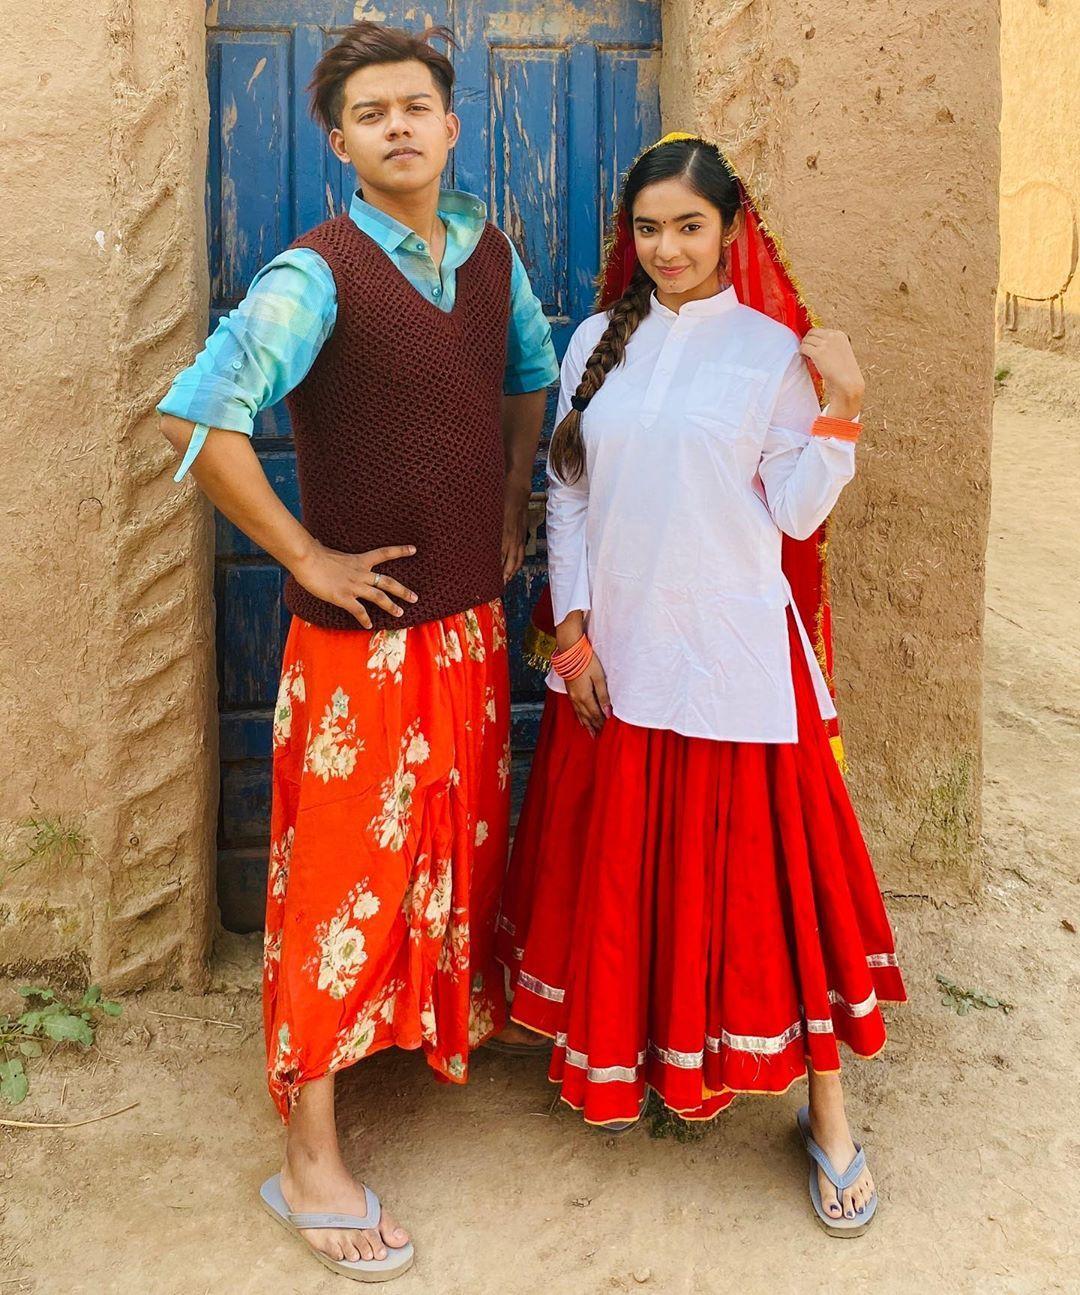 "Anushka Sen on Instagram: ""ਕਡੇ ਮੇਰੇ ਕੋਲ ਵਿਹ ਆ ਜਾਯਂ  ਬਸ ਘੁੰਮਦਾ ਹੈ ਨਾ ਰੇ ਜਾਯਂ 🤍 . @riyaz.14  @desimusicfactory @anshul300 @raghav.sharma.14661"""